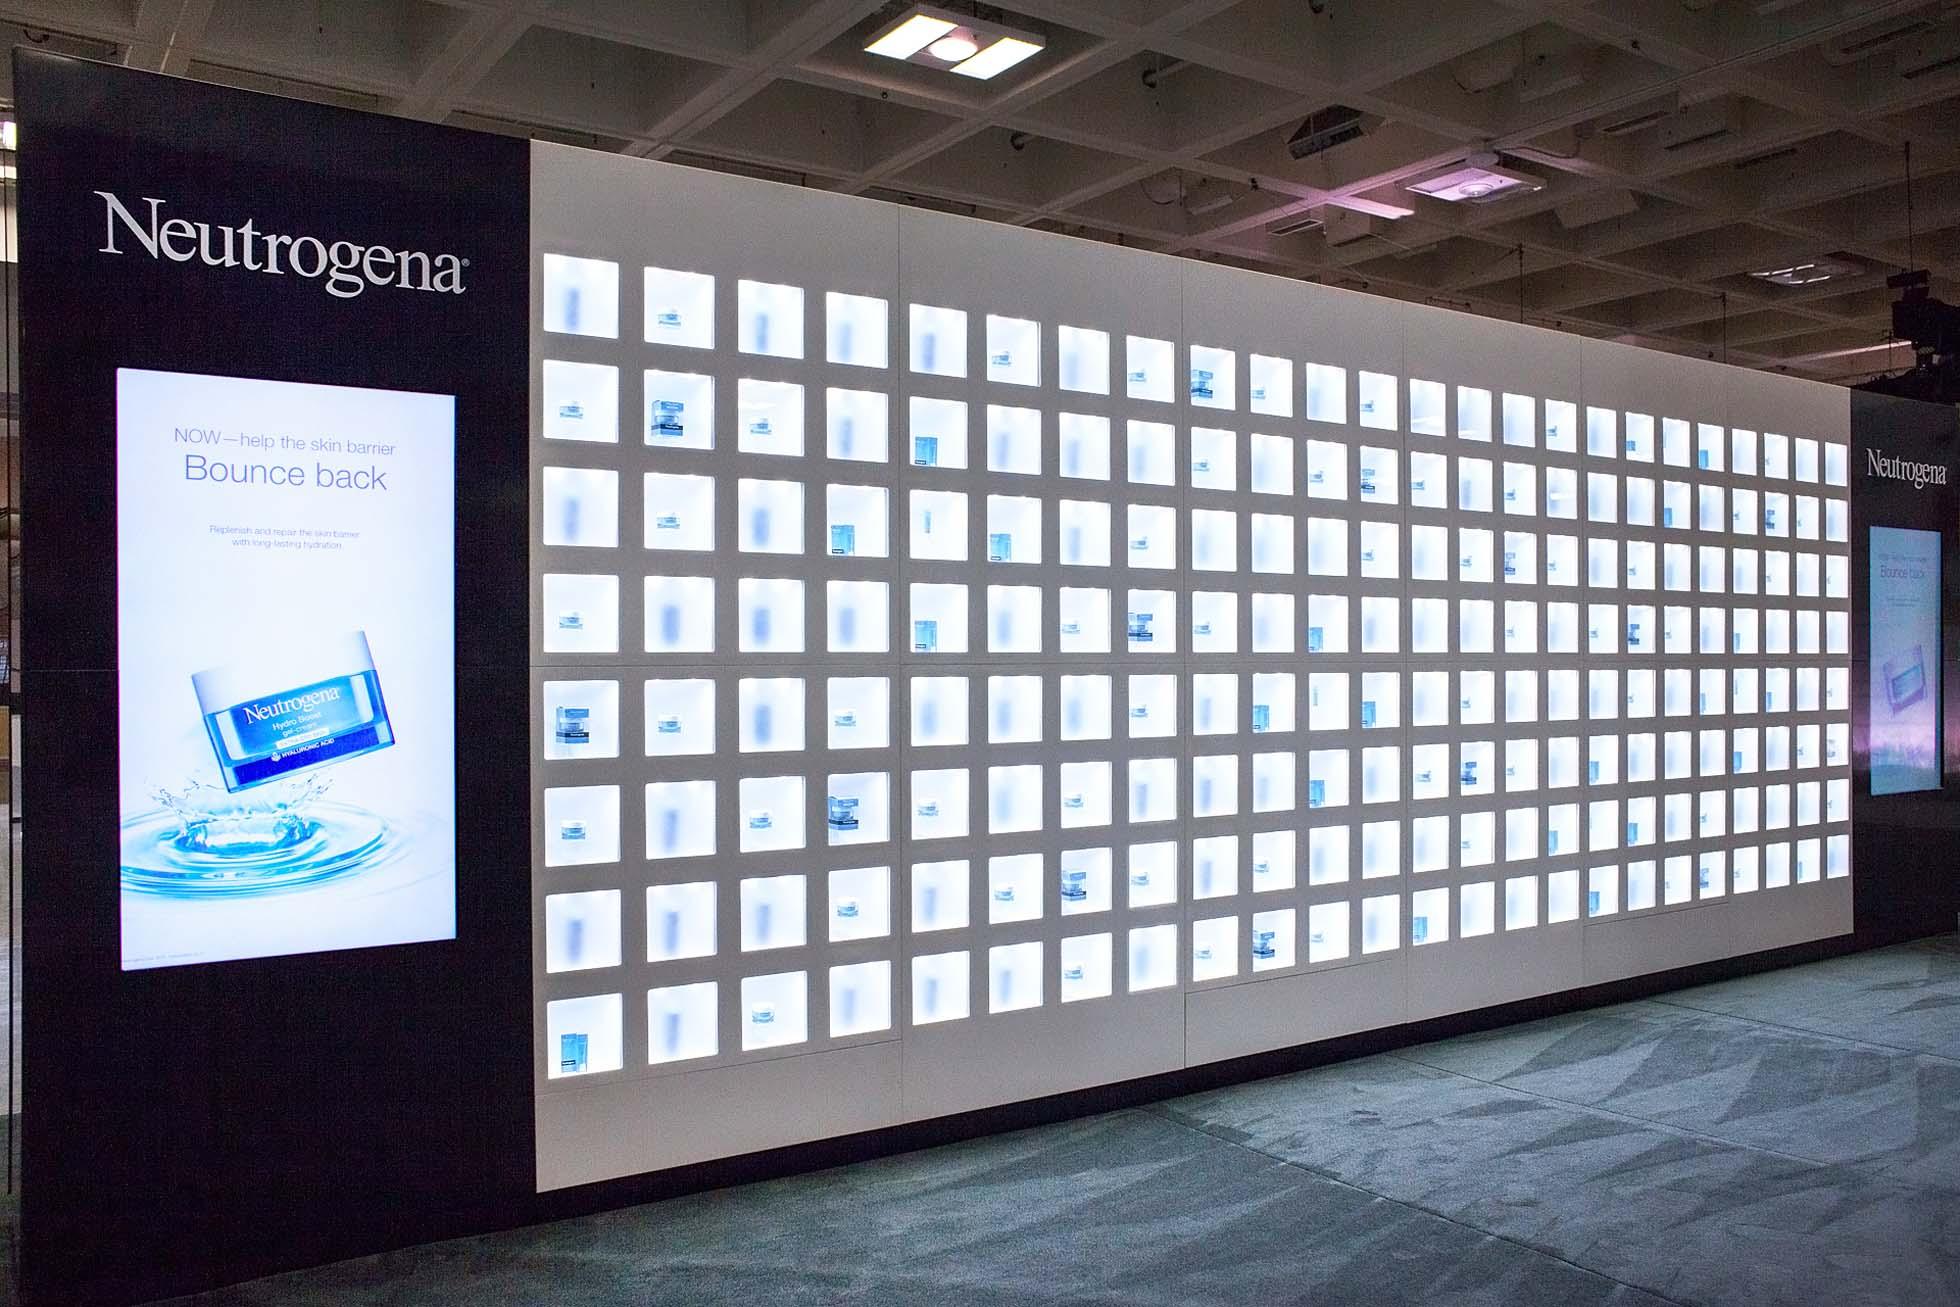 Iontank - Neutrogena PixelWall